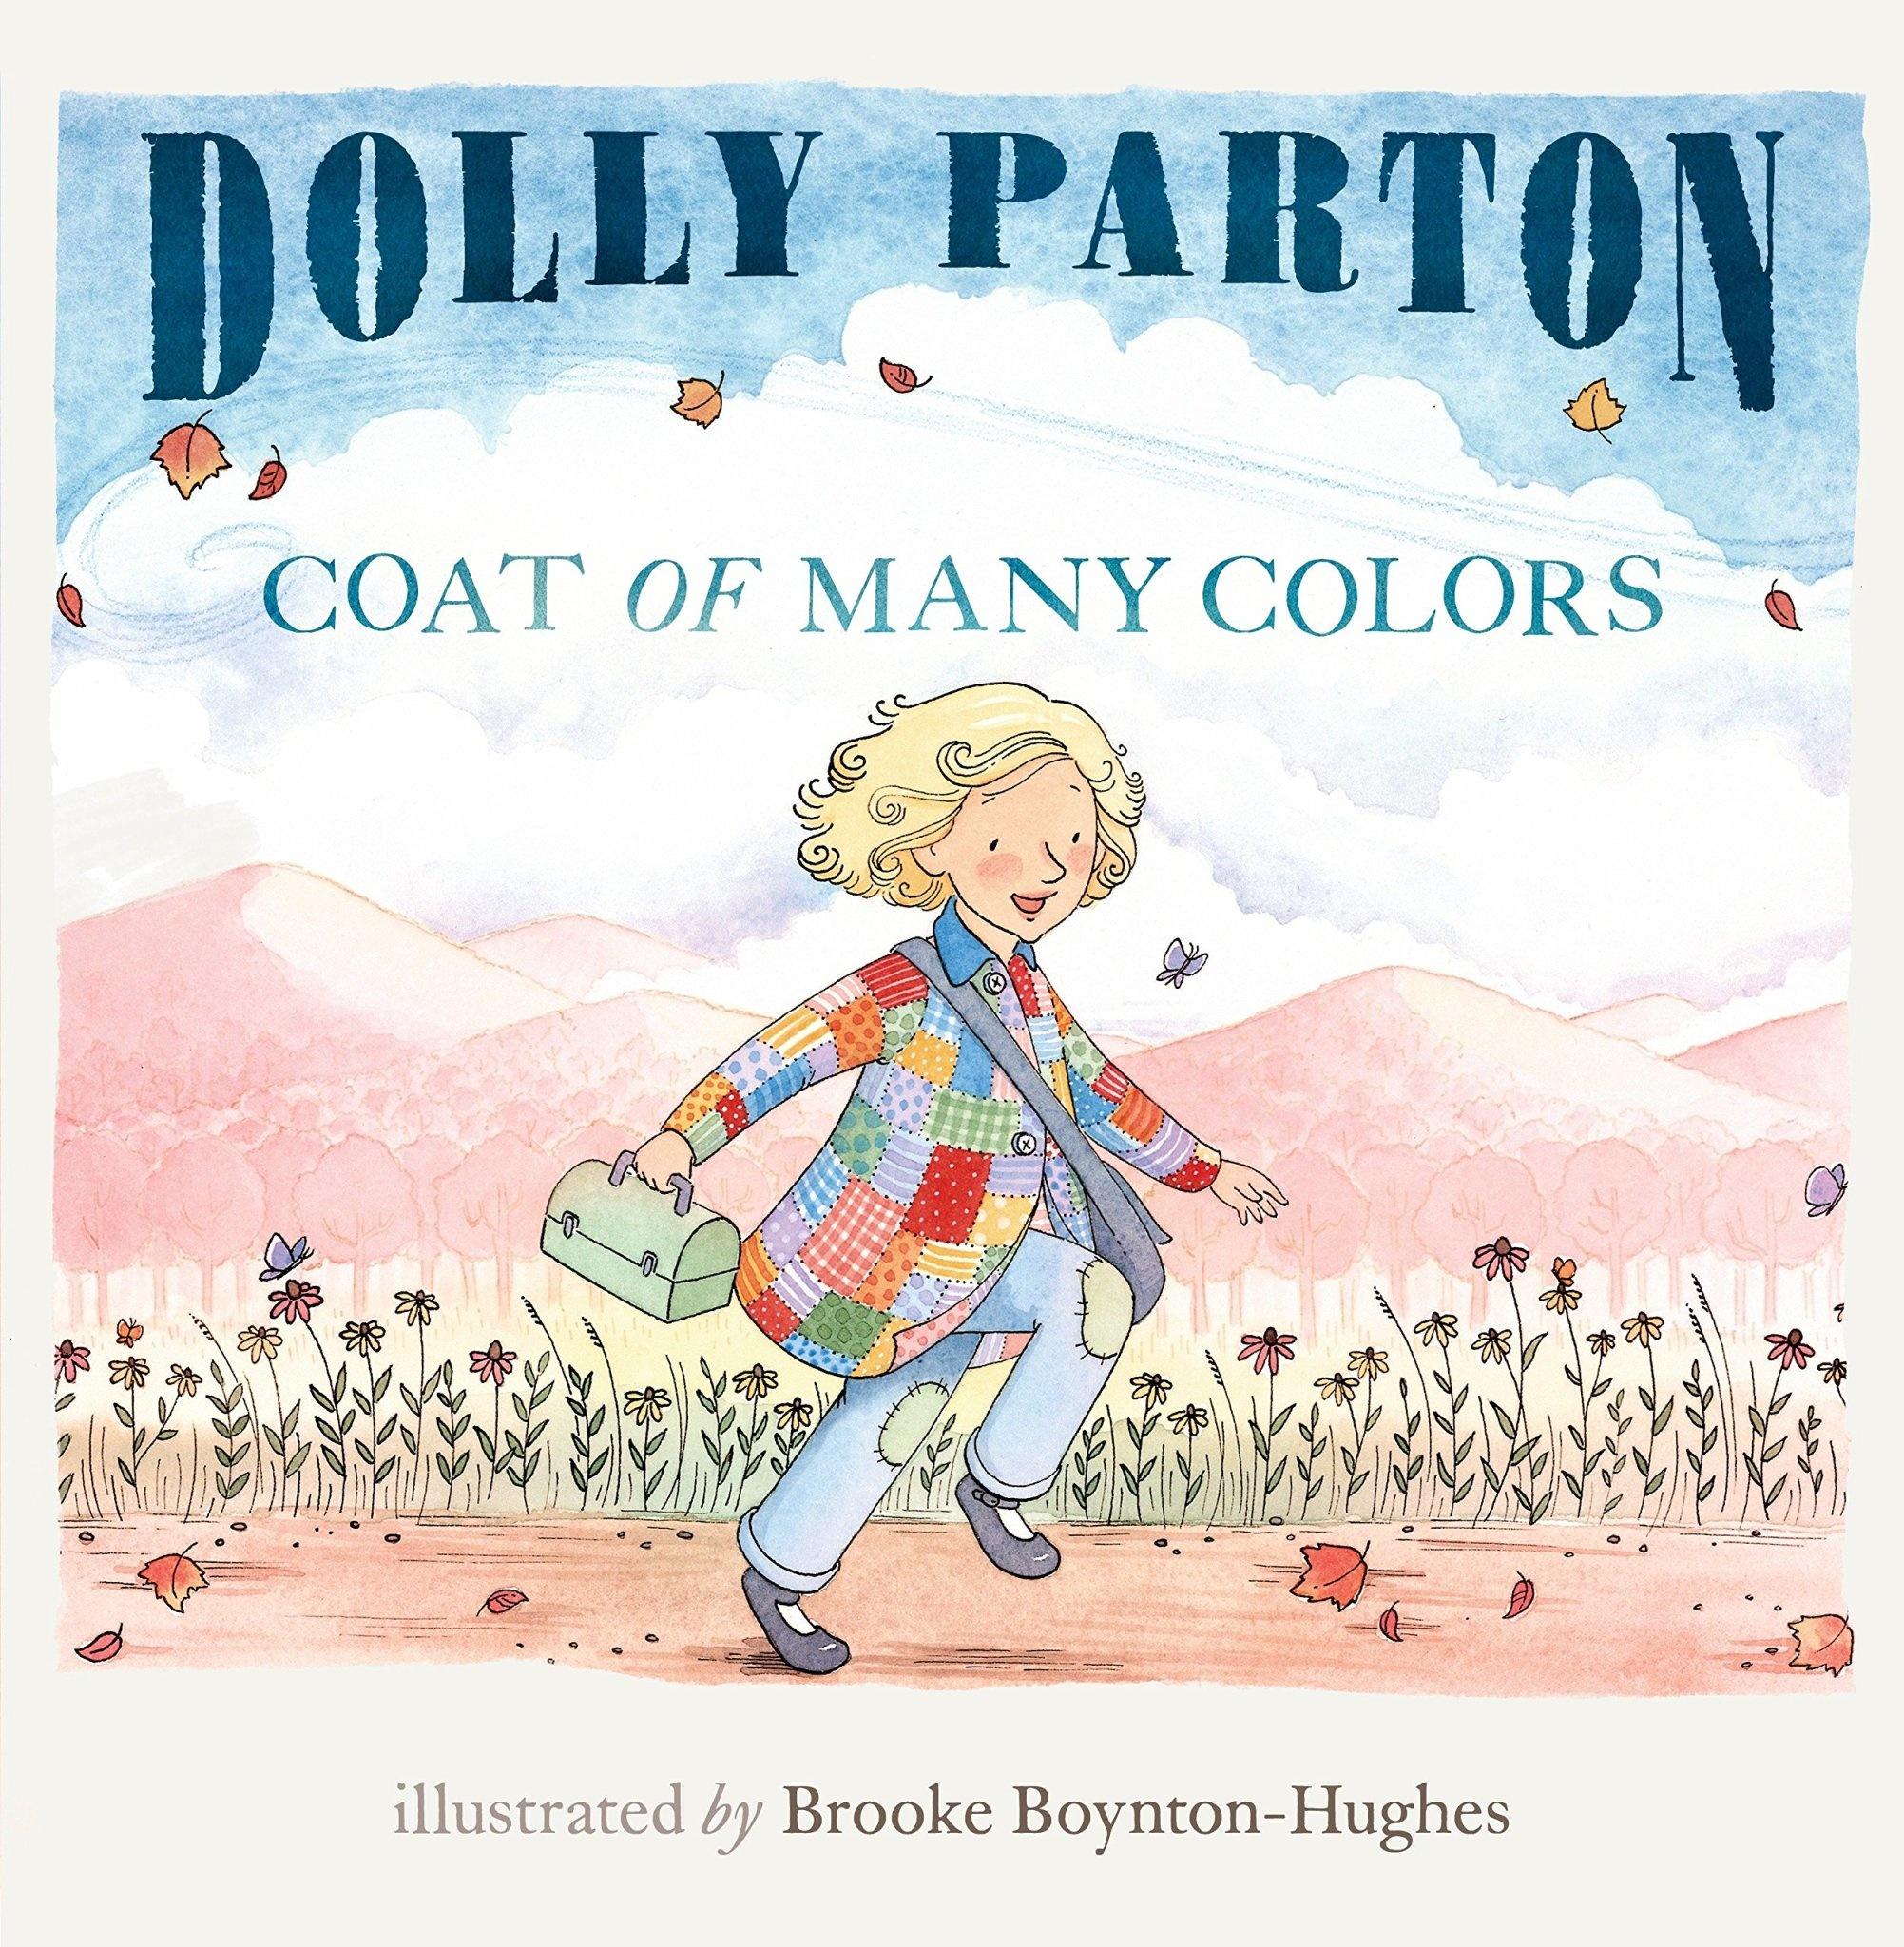 Kids Coat Of Many Colors - Dolly Parton